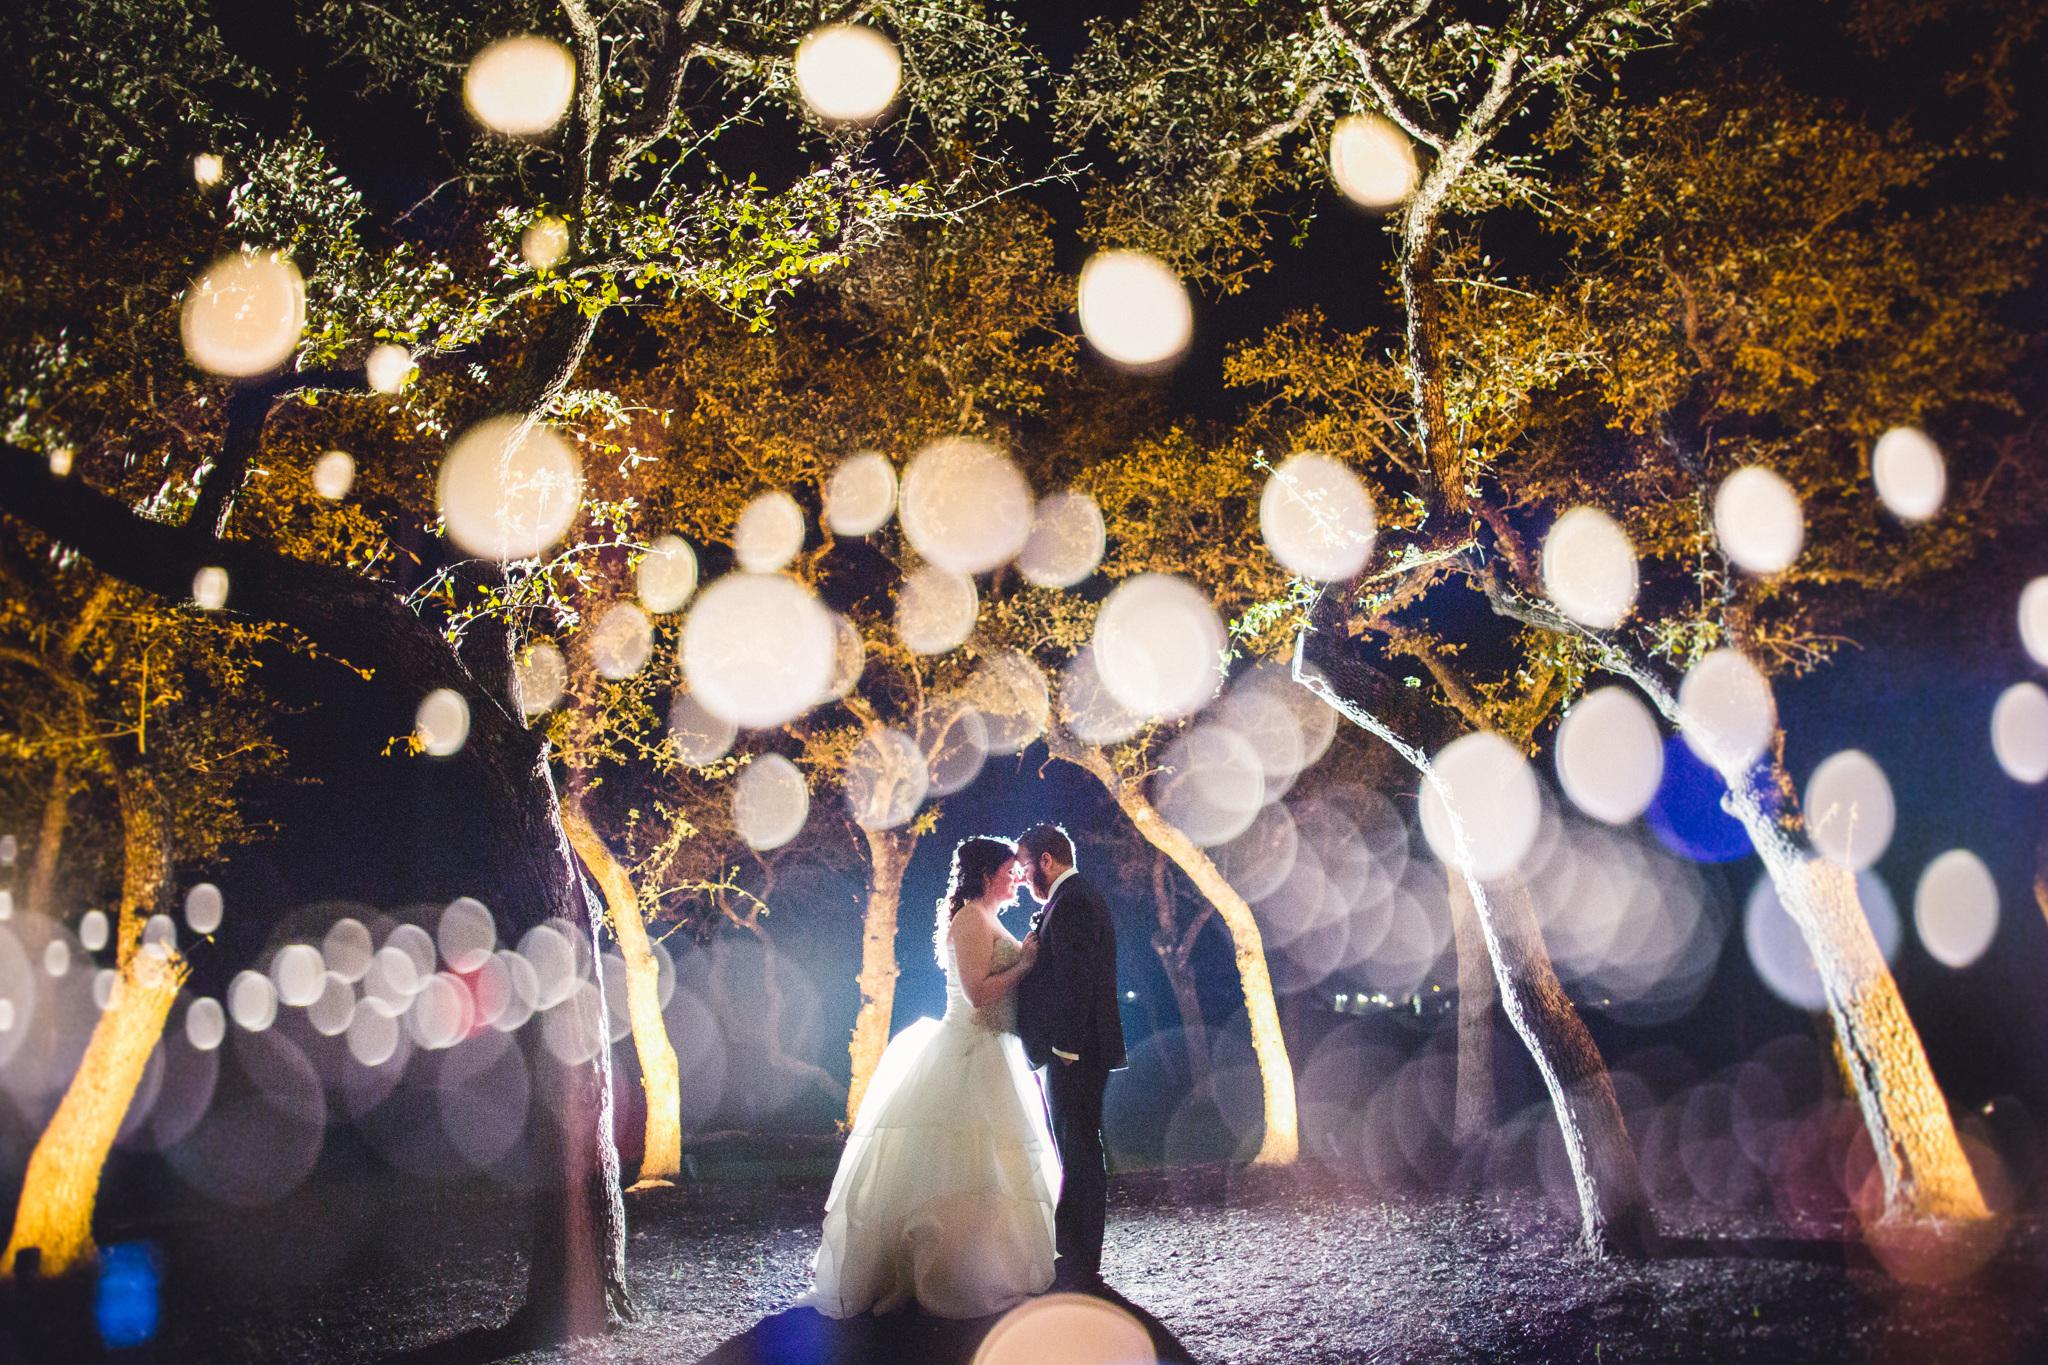 Erin-Scott-wedding-happydaymedia-15.jpg